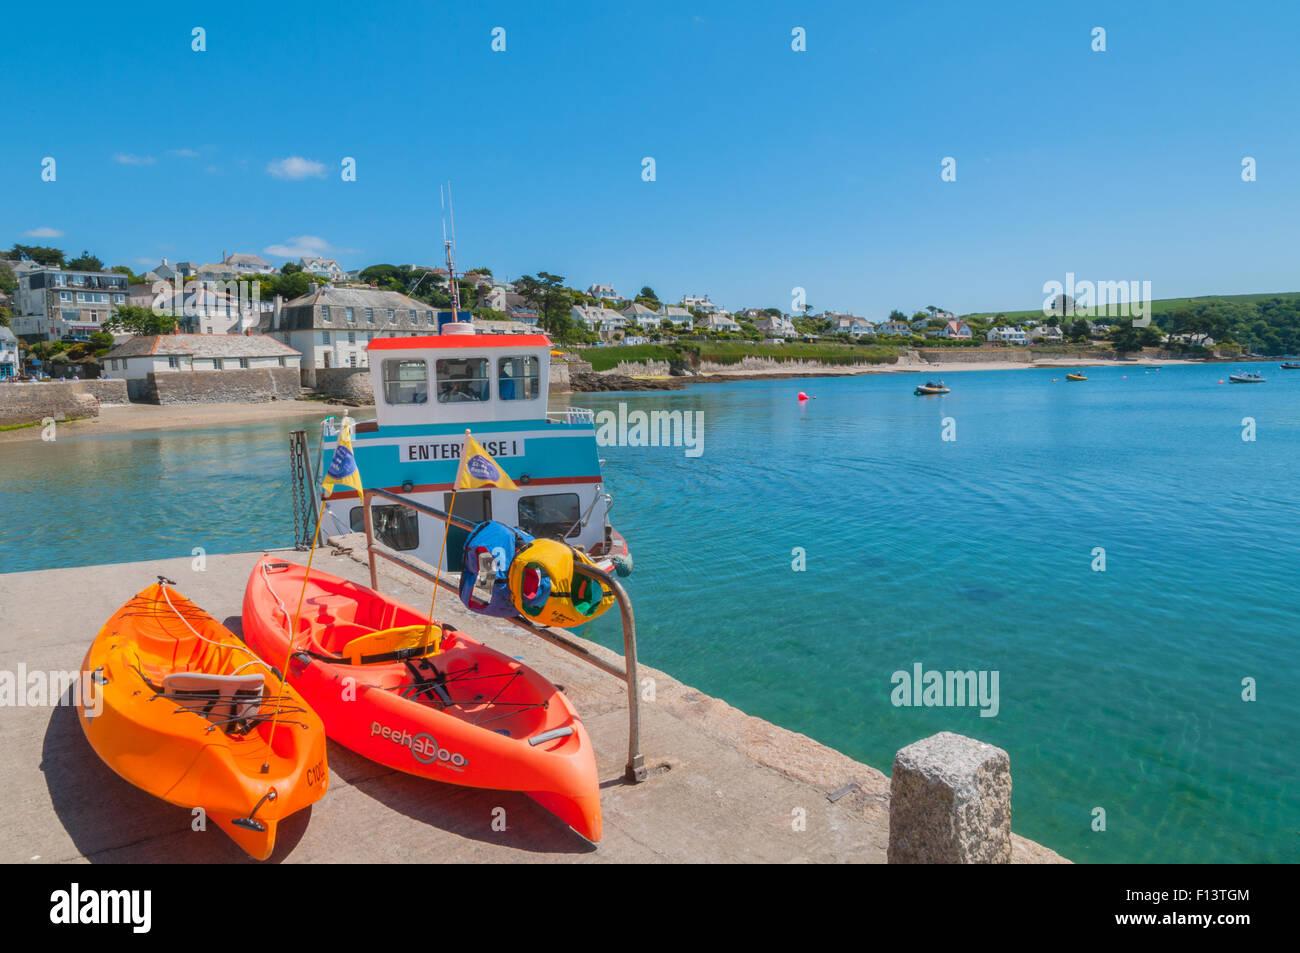 Pleasure Boat and Sea Kayaks at St Mawes Cornwall England - Stock Image